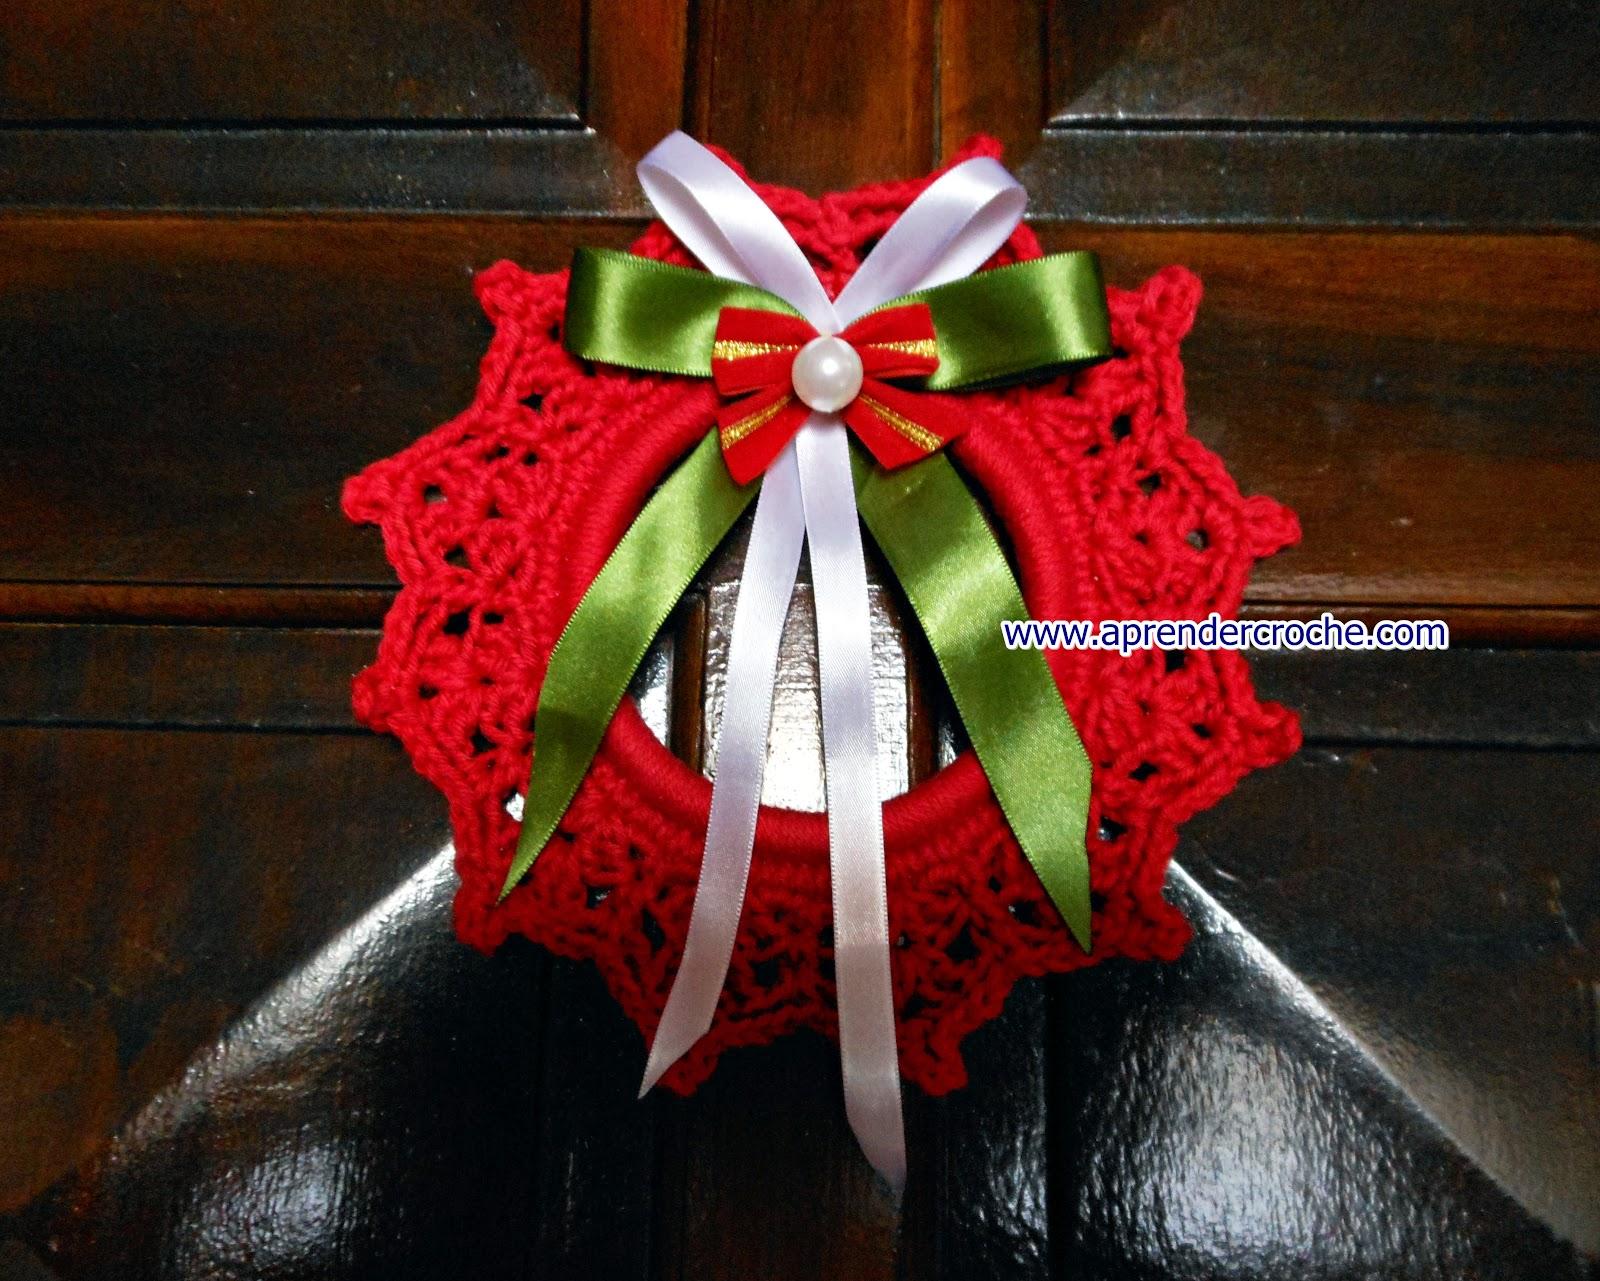 aprender croche natal guirlanda porta laços fitas edinir-croche dvd maxcolor barroco circulo loja frete gratis youtube facebook